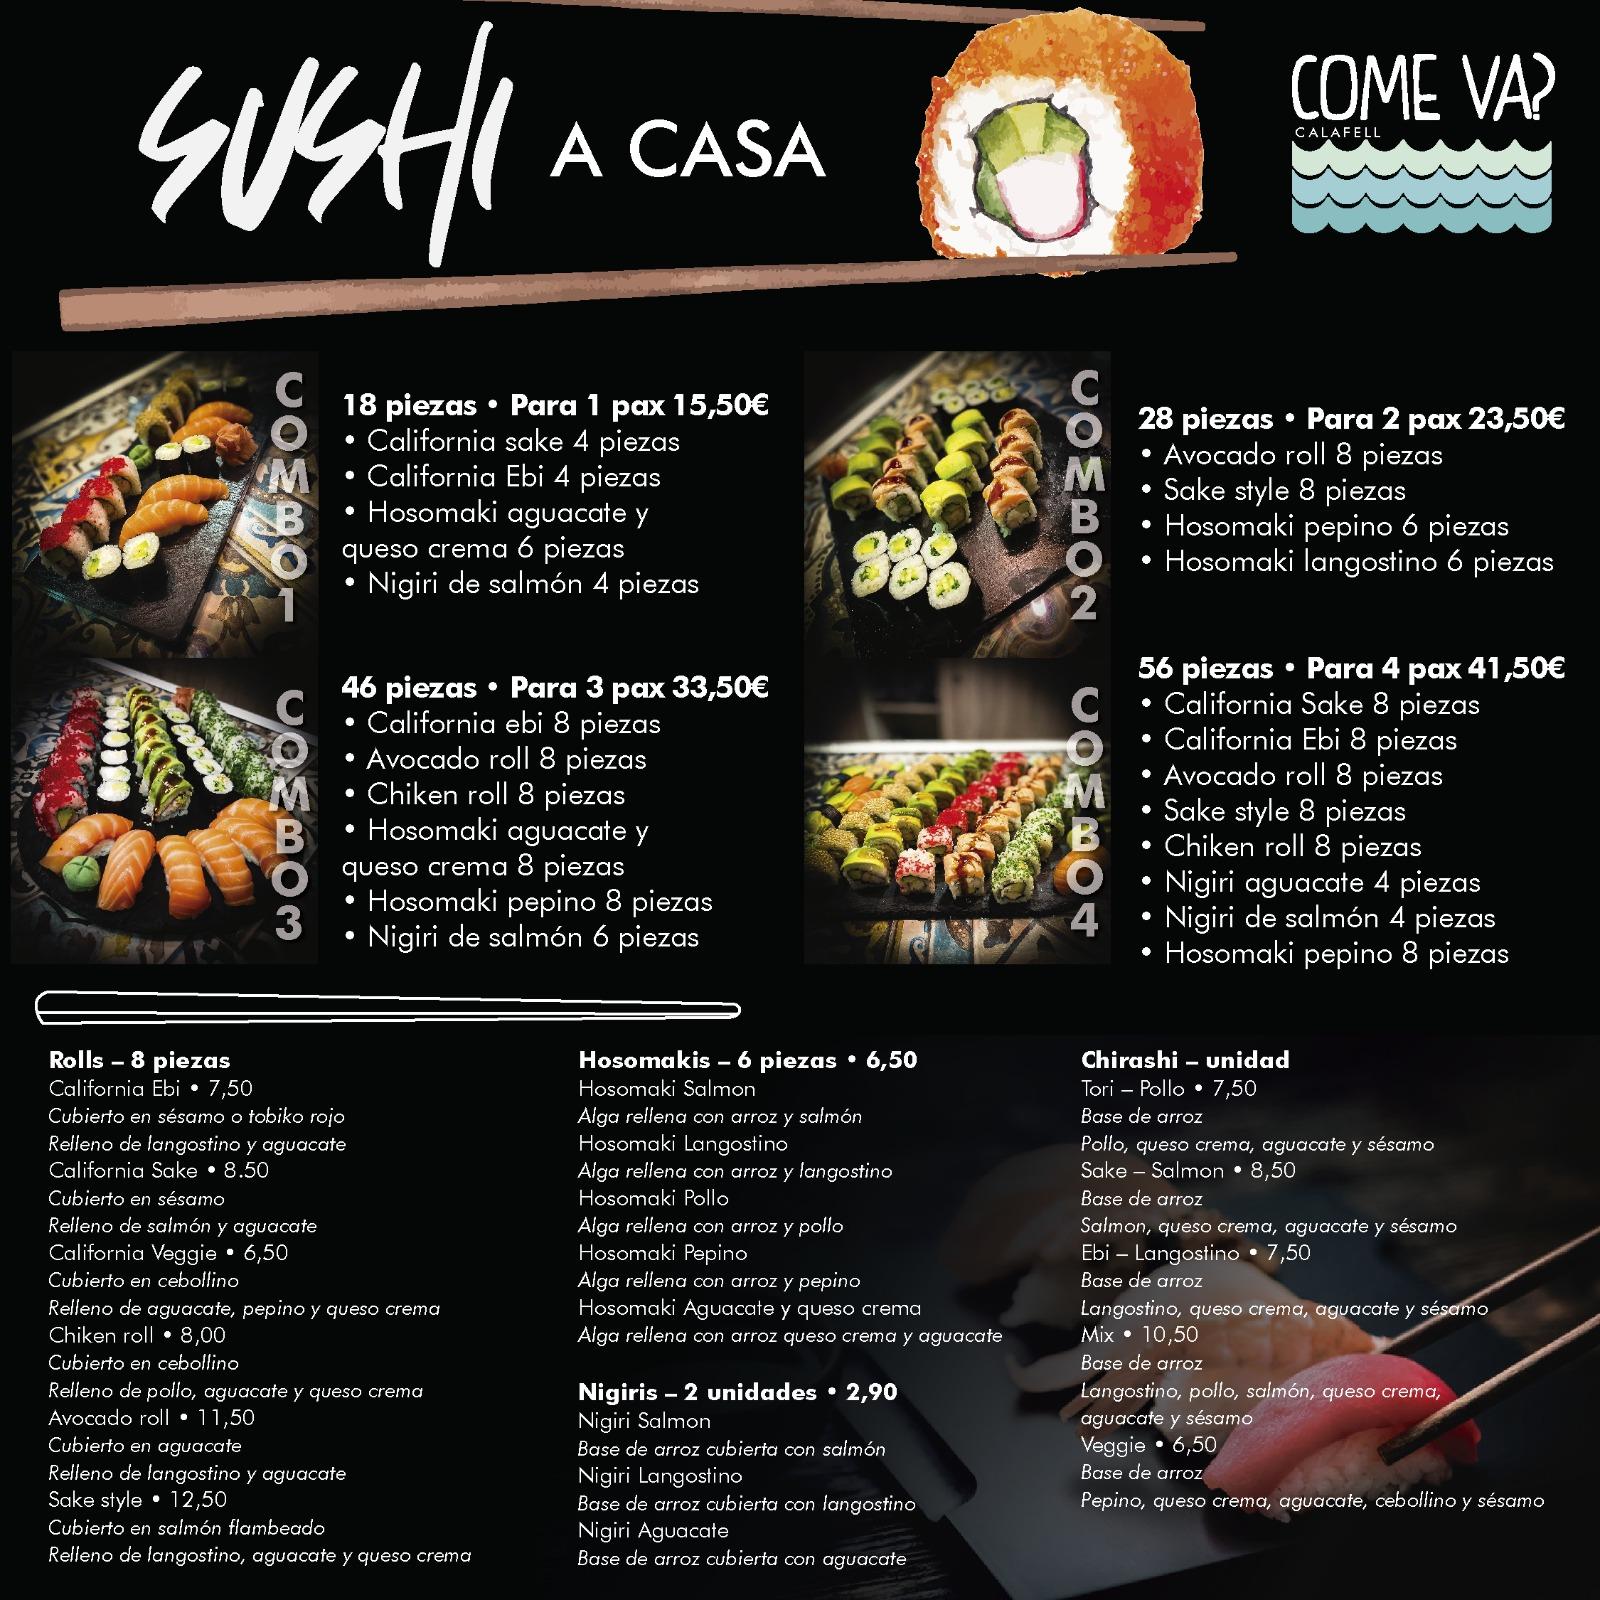 Sushi a casa come va calafell